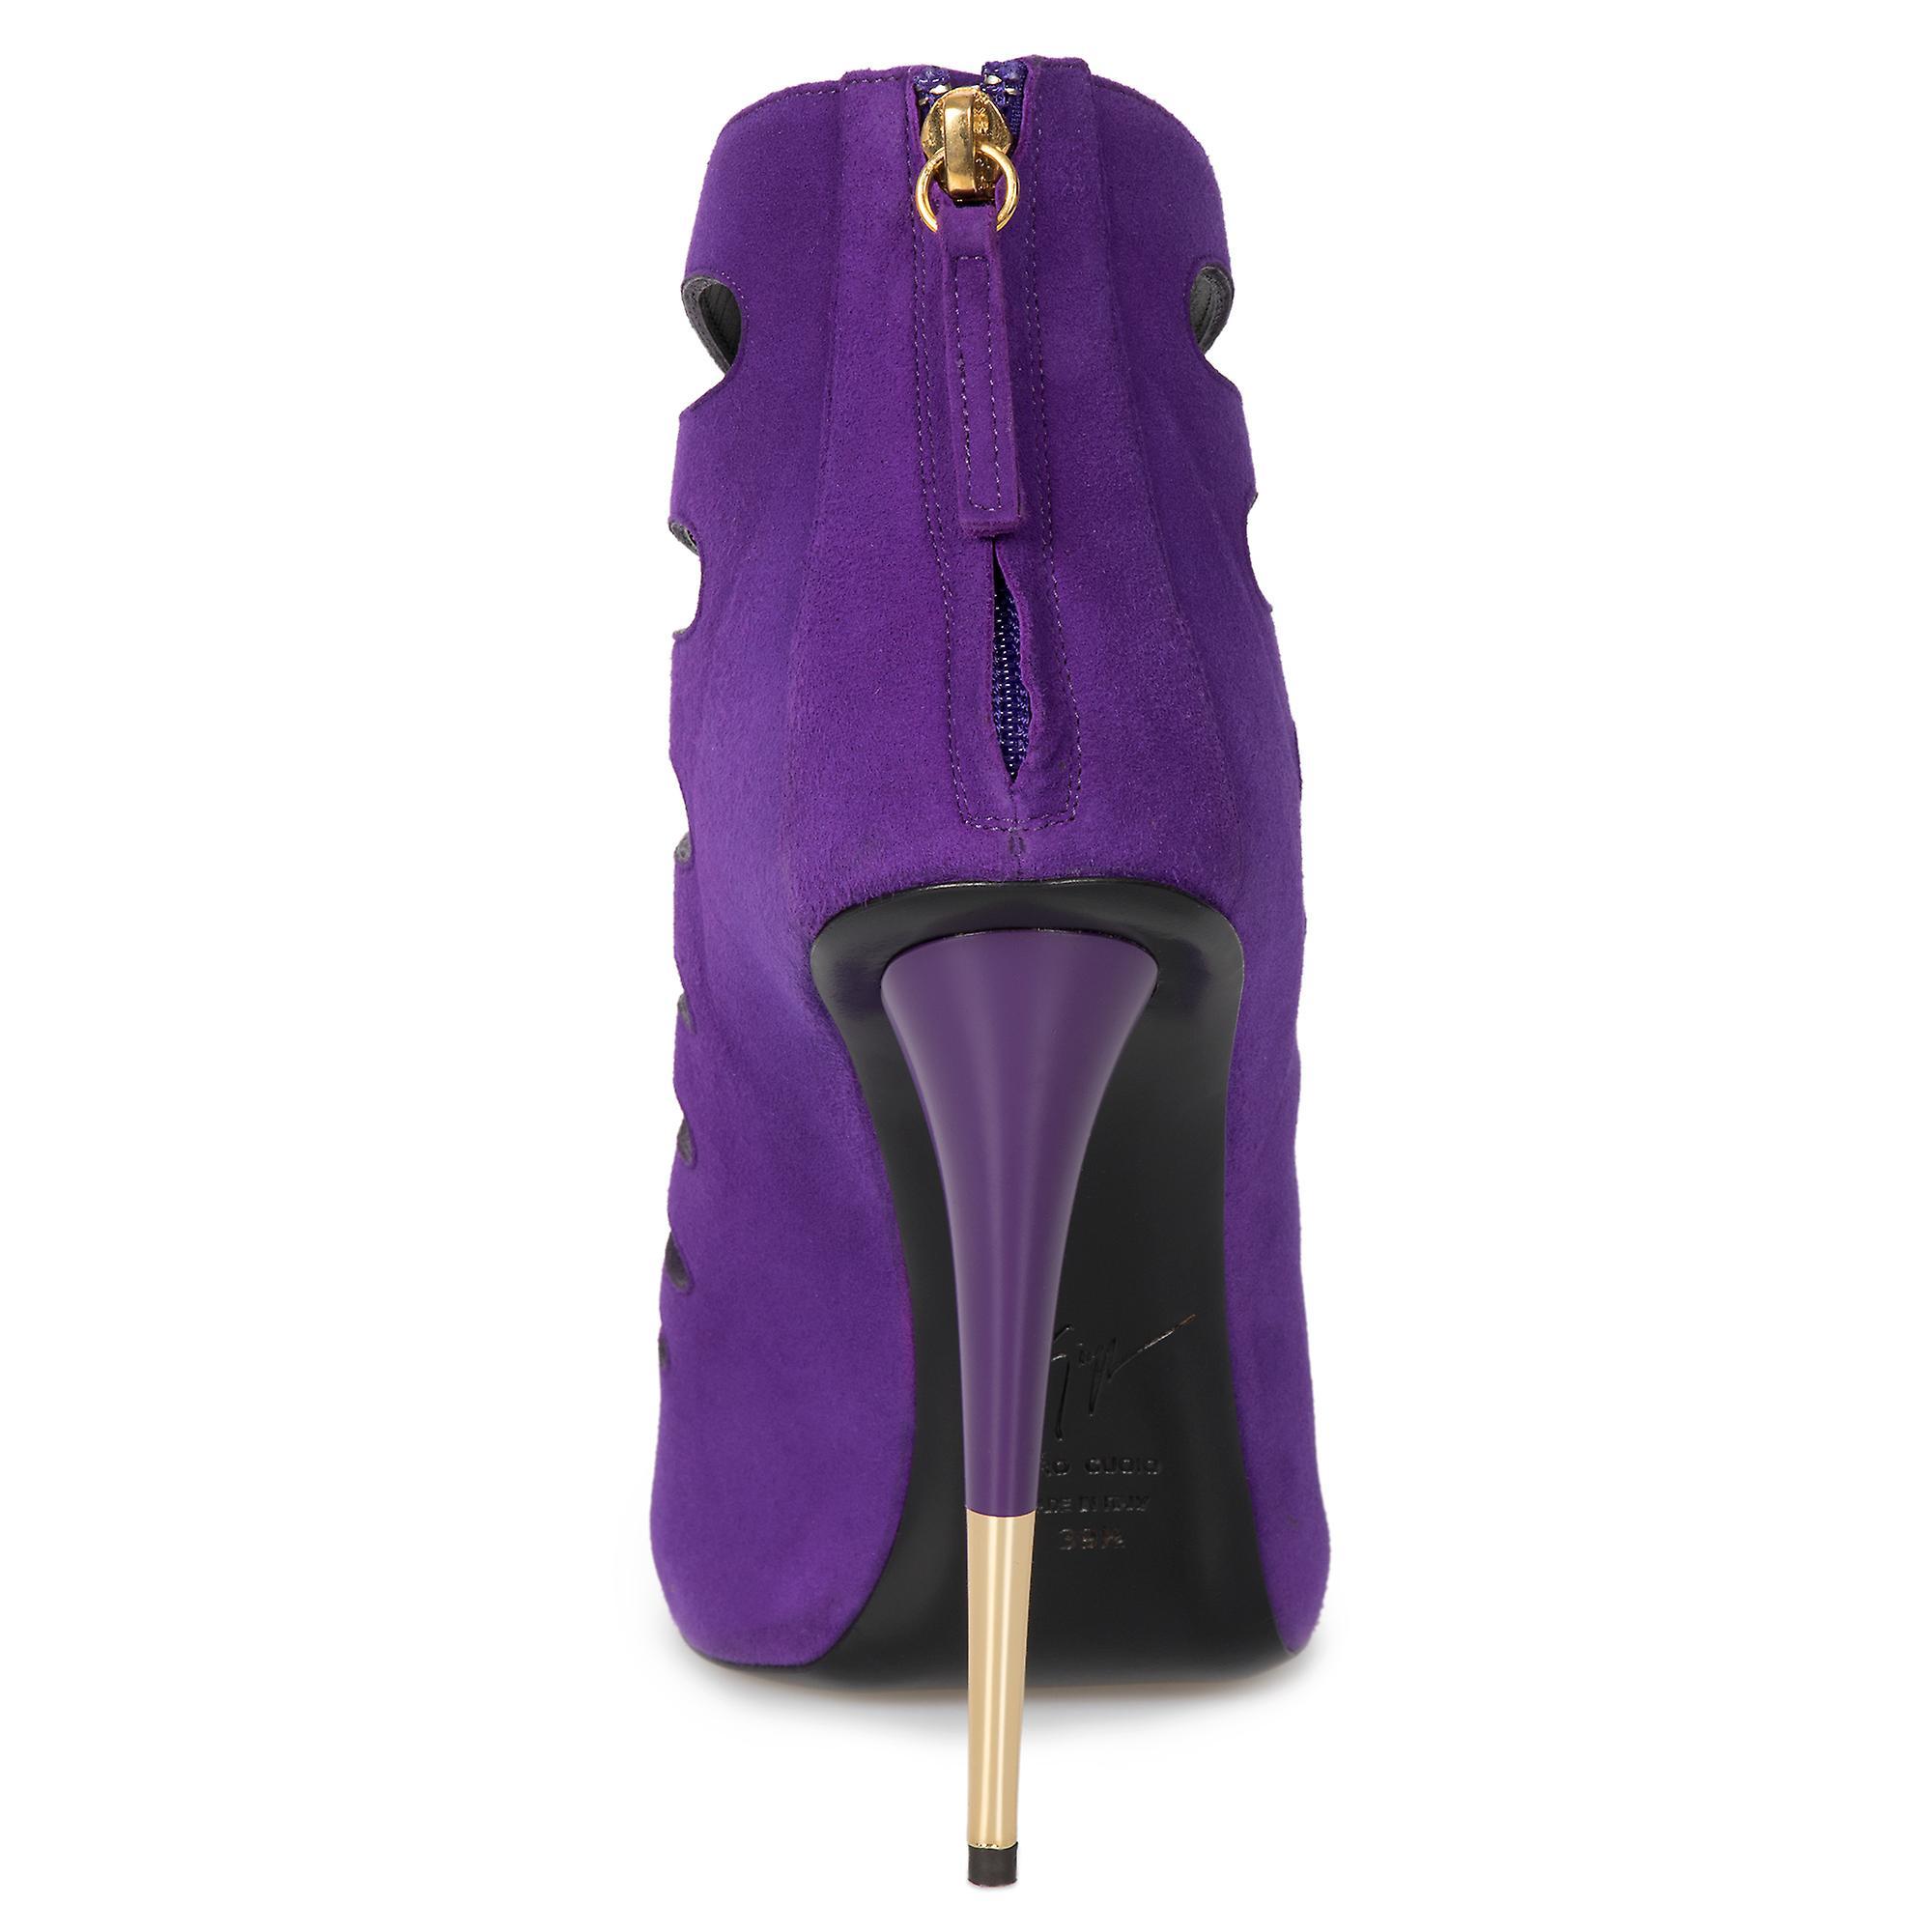 Giuseppe Zanotti Alien Violet Cutout Suede 127mm Ankle Boots